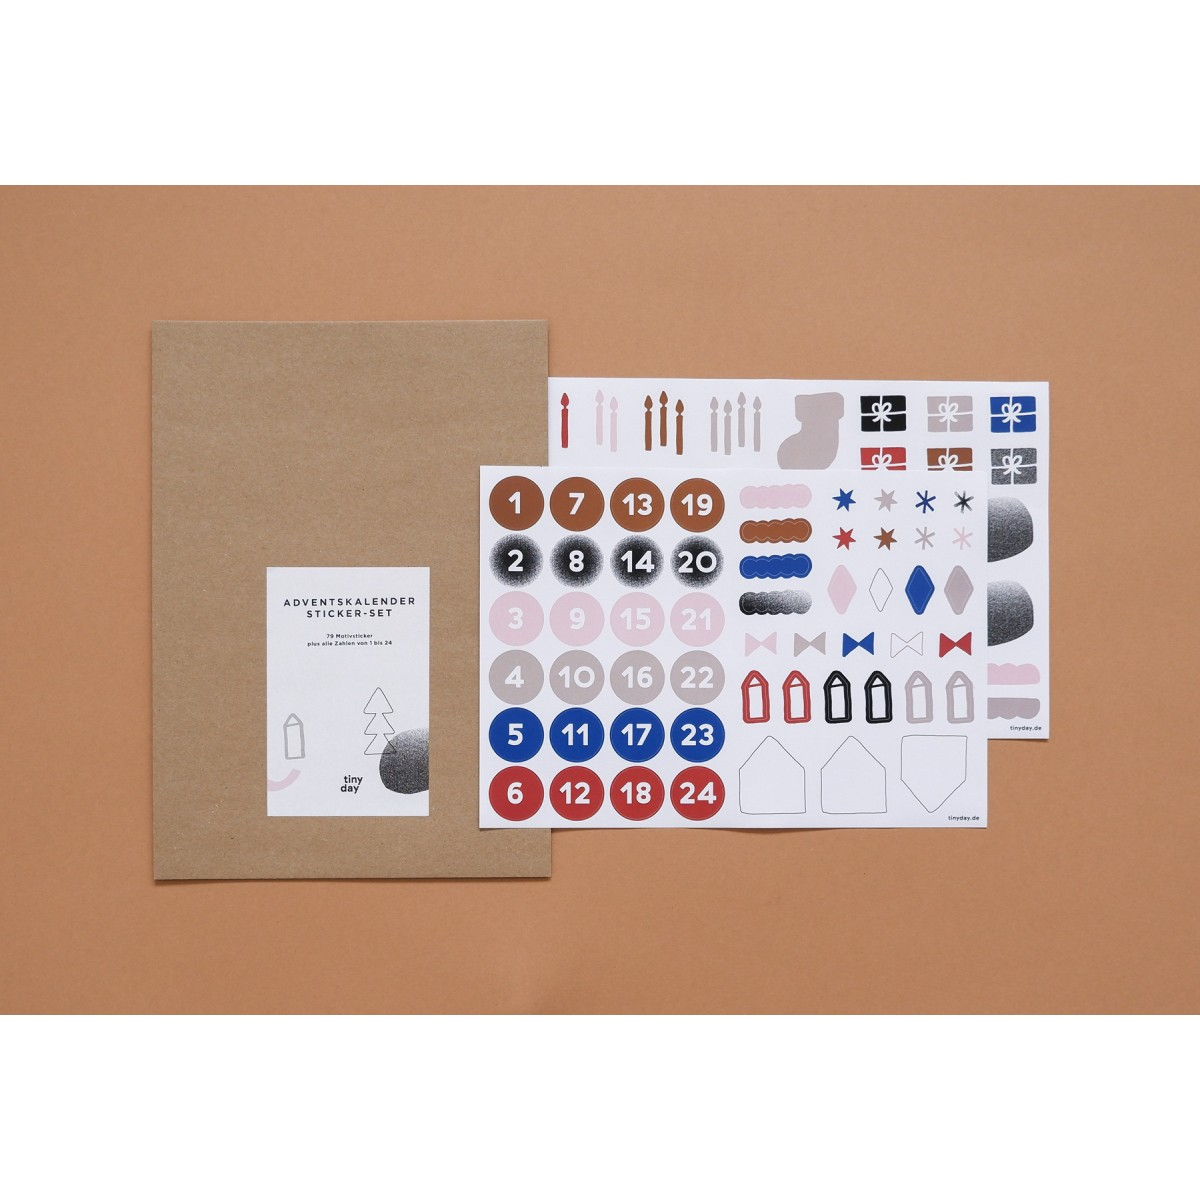 tinyday . Adventskalender Sticker-Set / Aufkleber